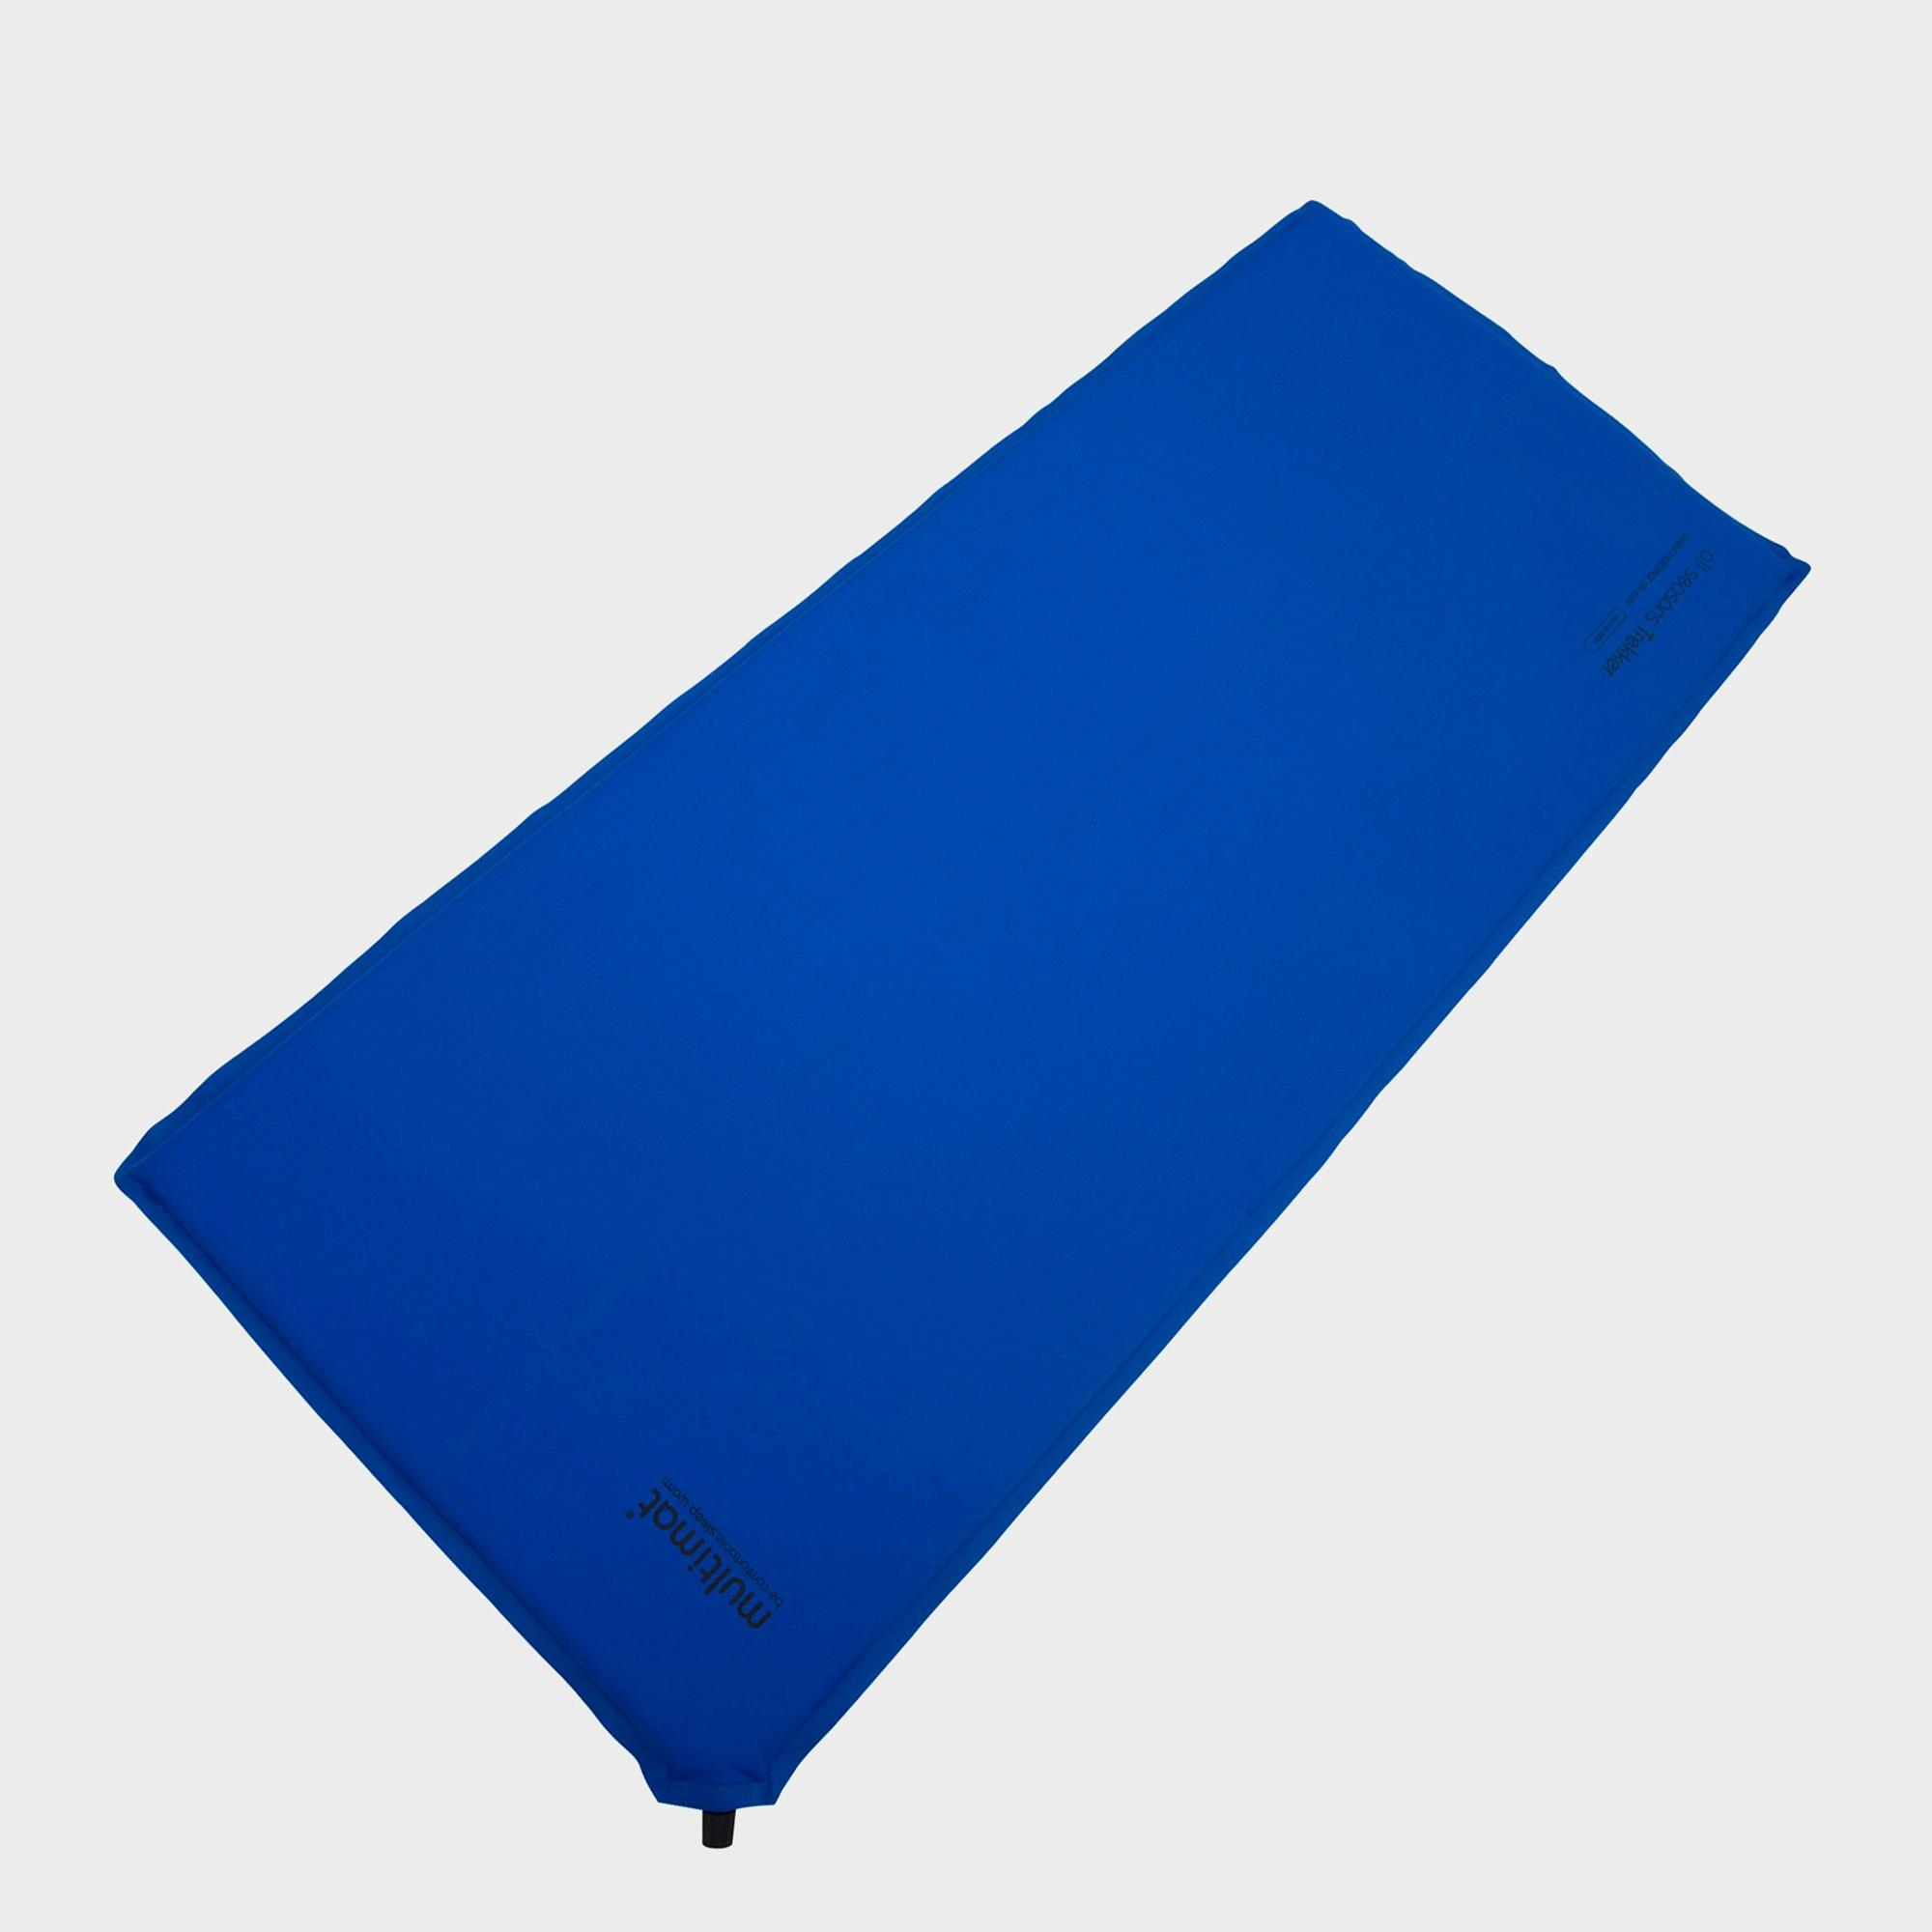 Multimat Trekker Compact 25 Self Inflating Sleeping Mat (Small), Blue